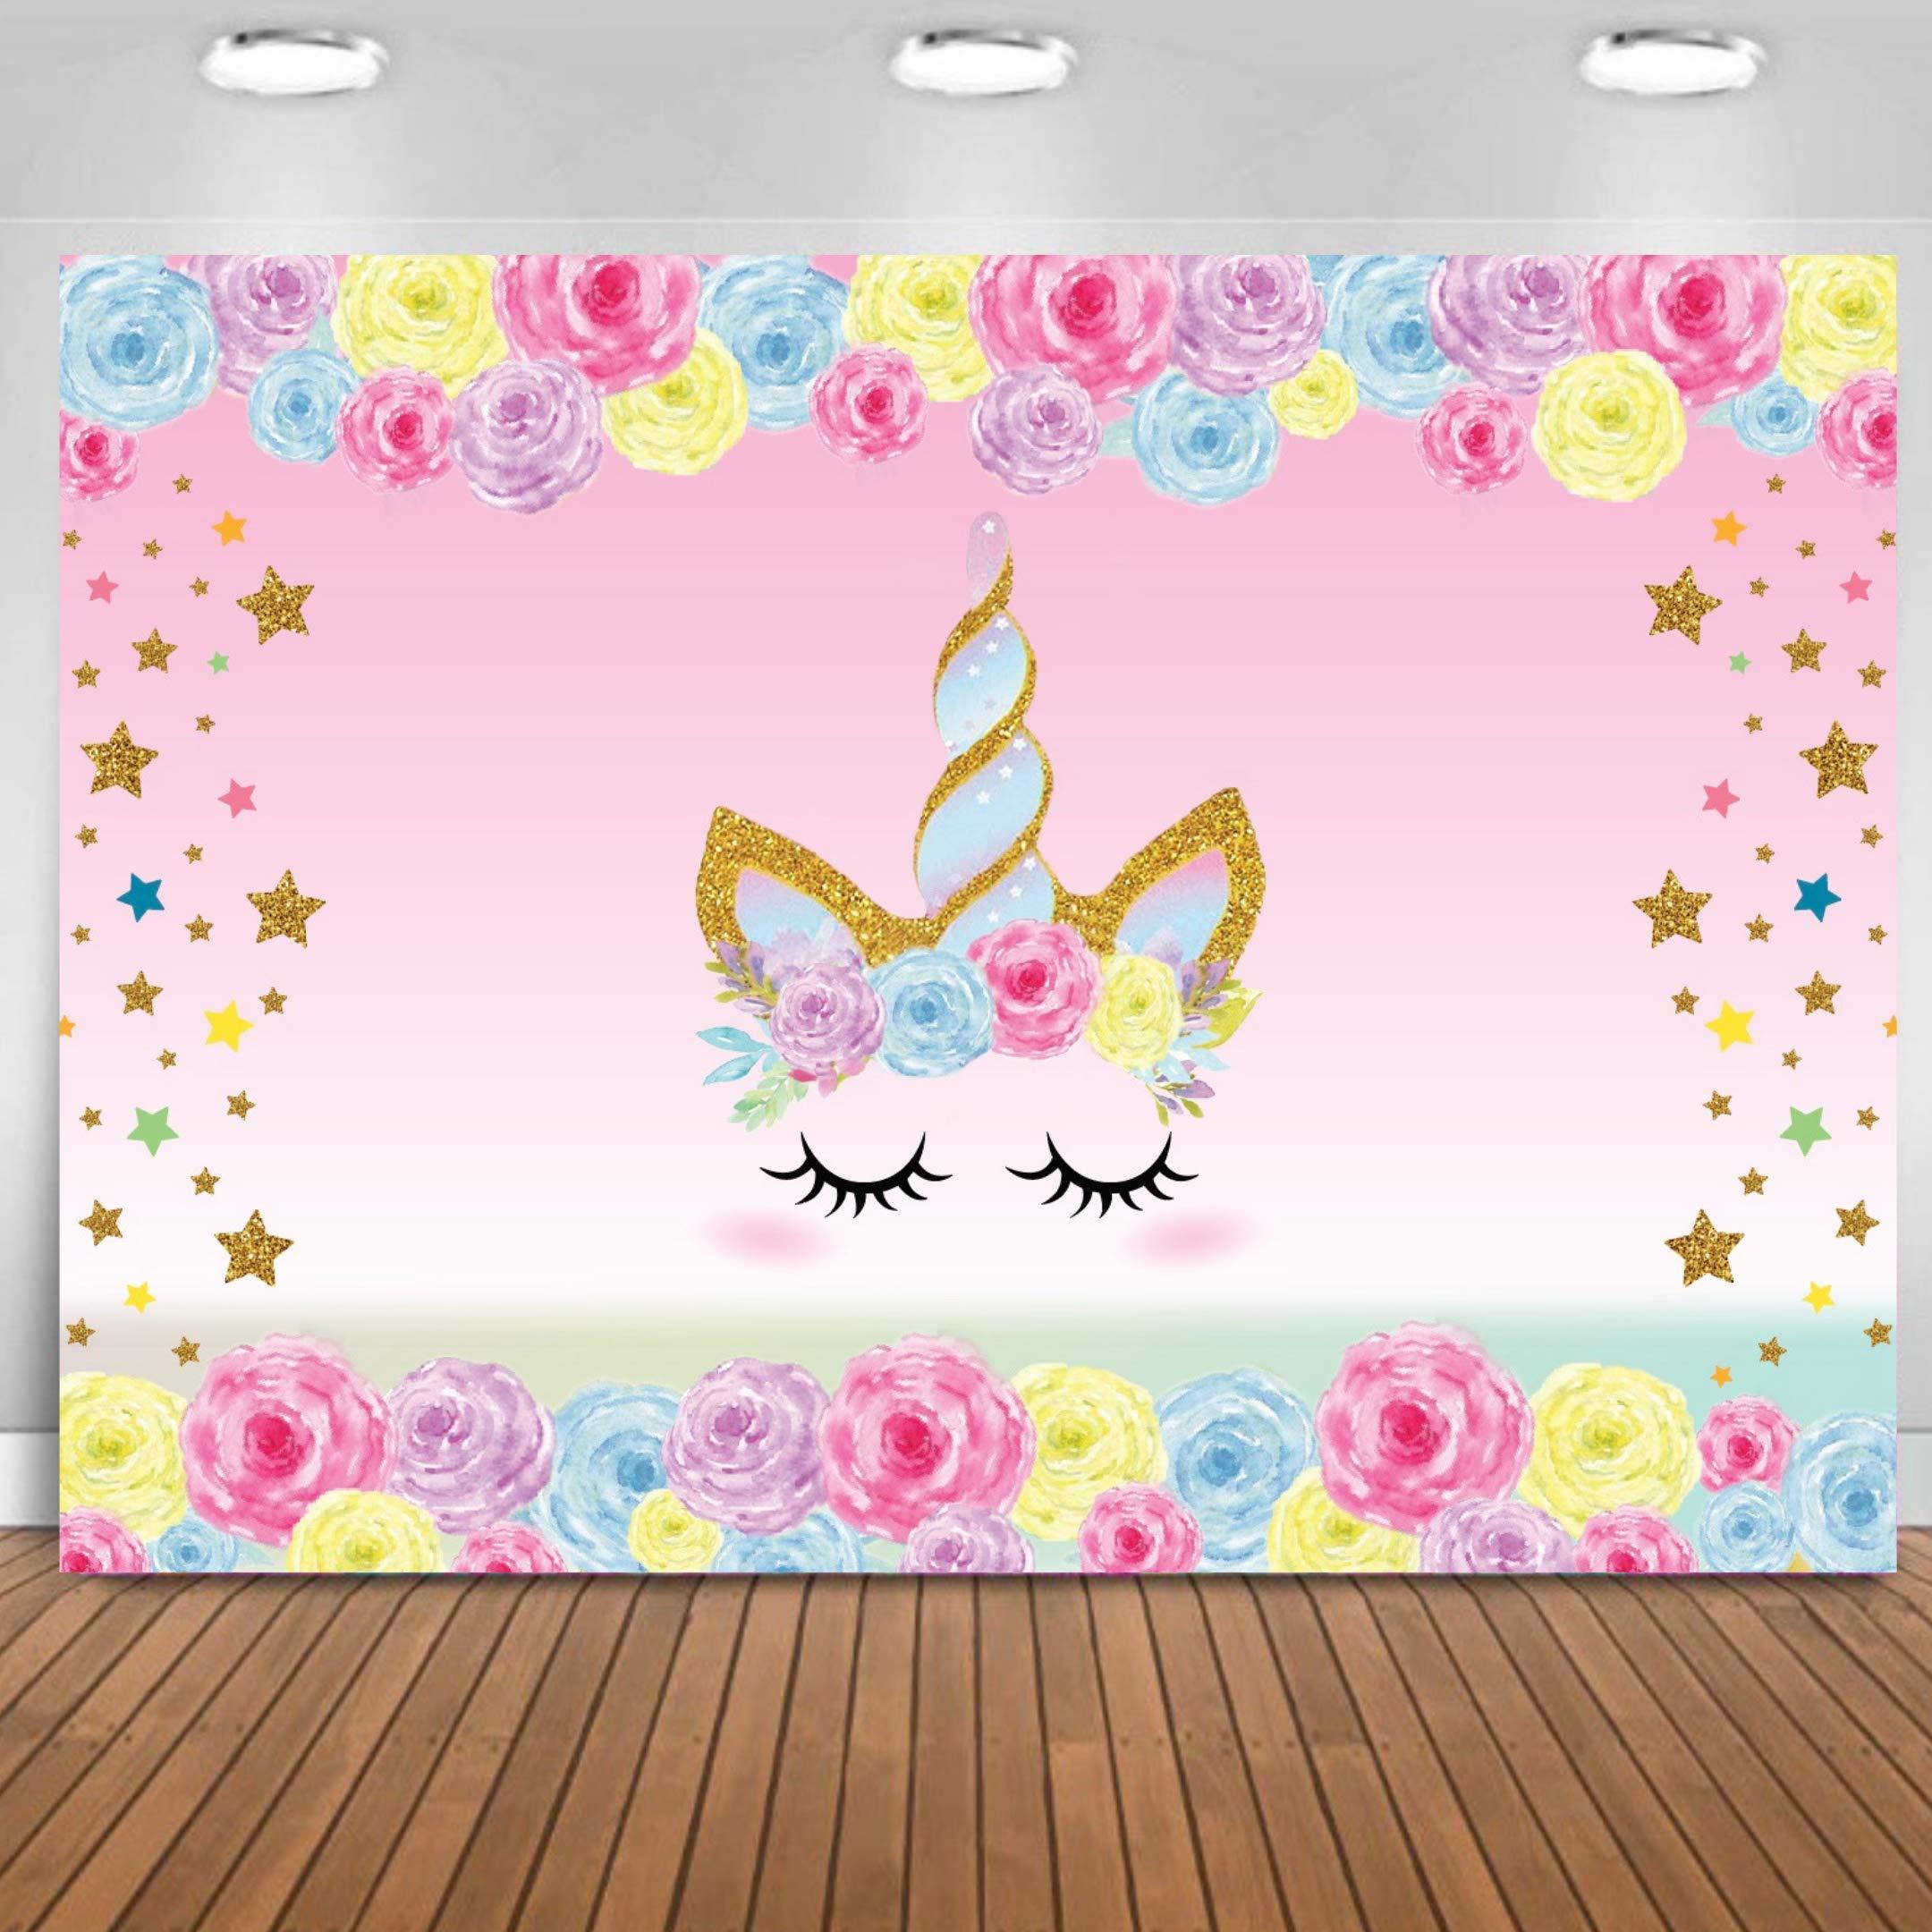 Unicorn Backdrop Birthday 3x5 ft Unicorn Photography Background for Girls Birthday Party, Rainbow Floral Backdrop Unicorn Party Supplies Studio